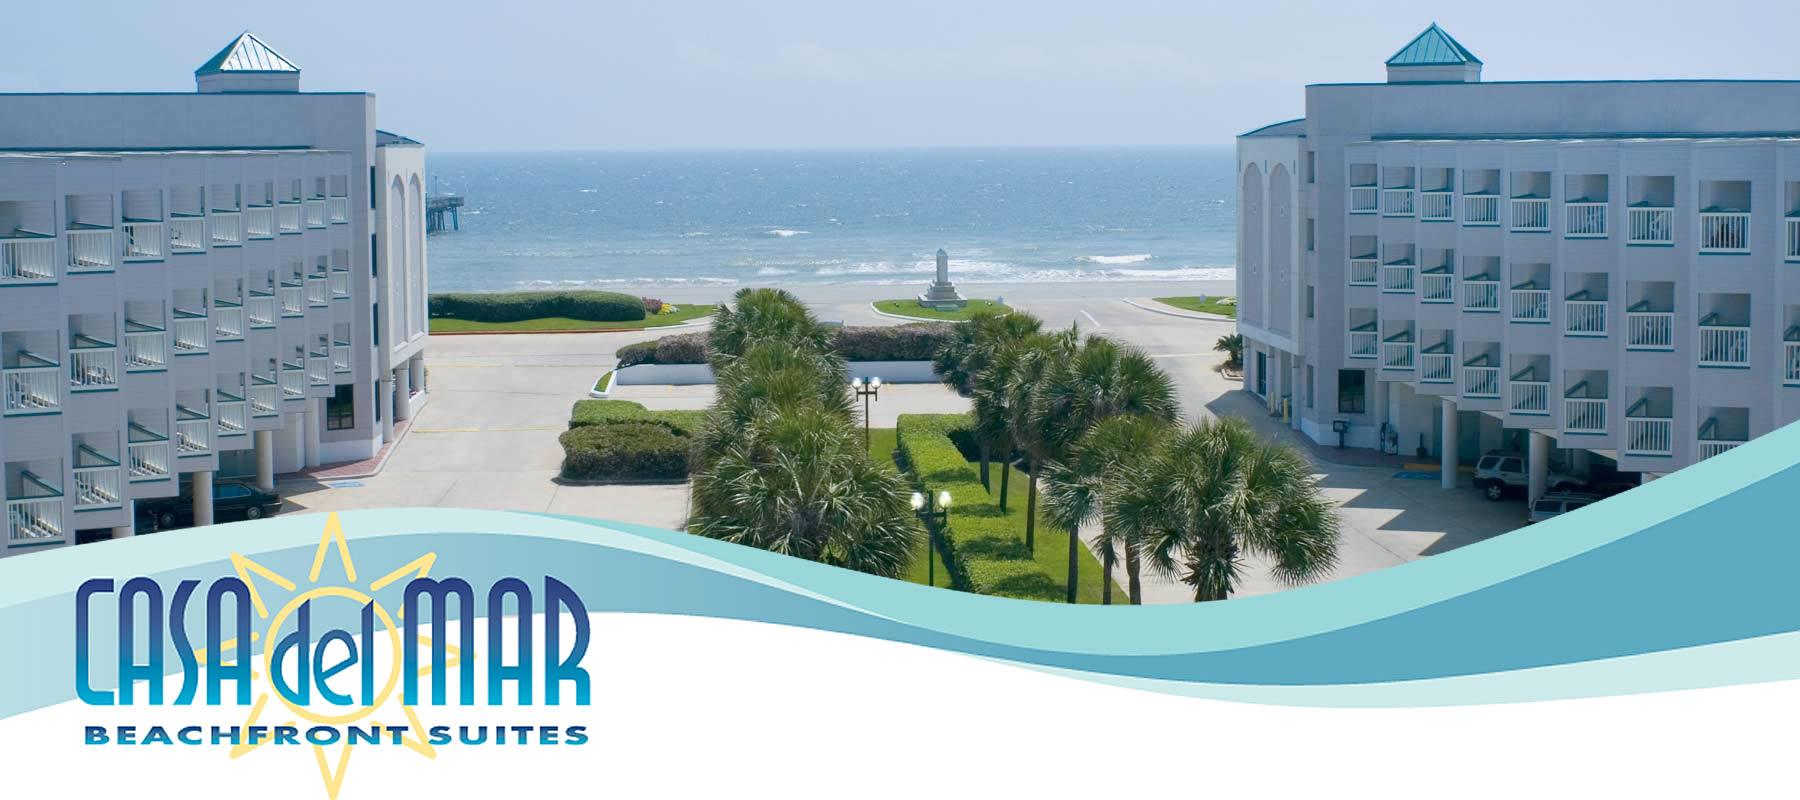 Casa Del Mar Beachfront Suites | Galveston Tx Condo Hotel - Map Of Hotels In Galveston Texas